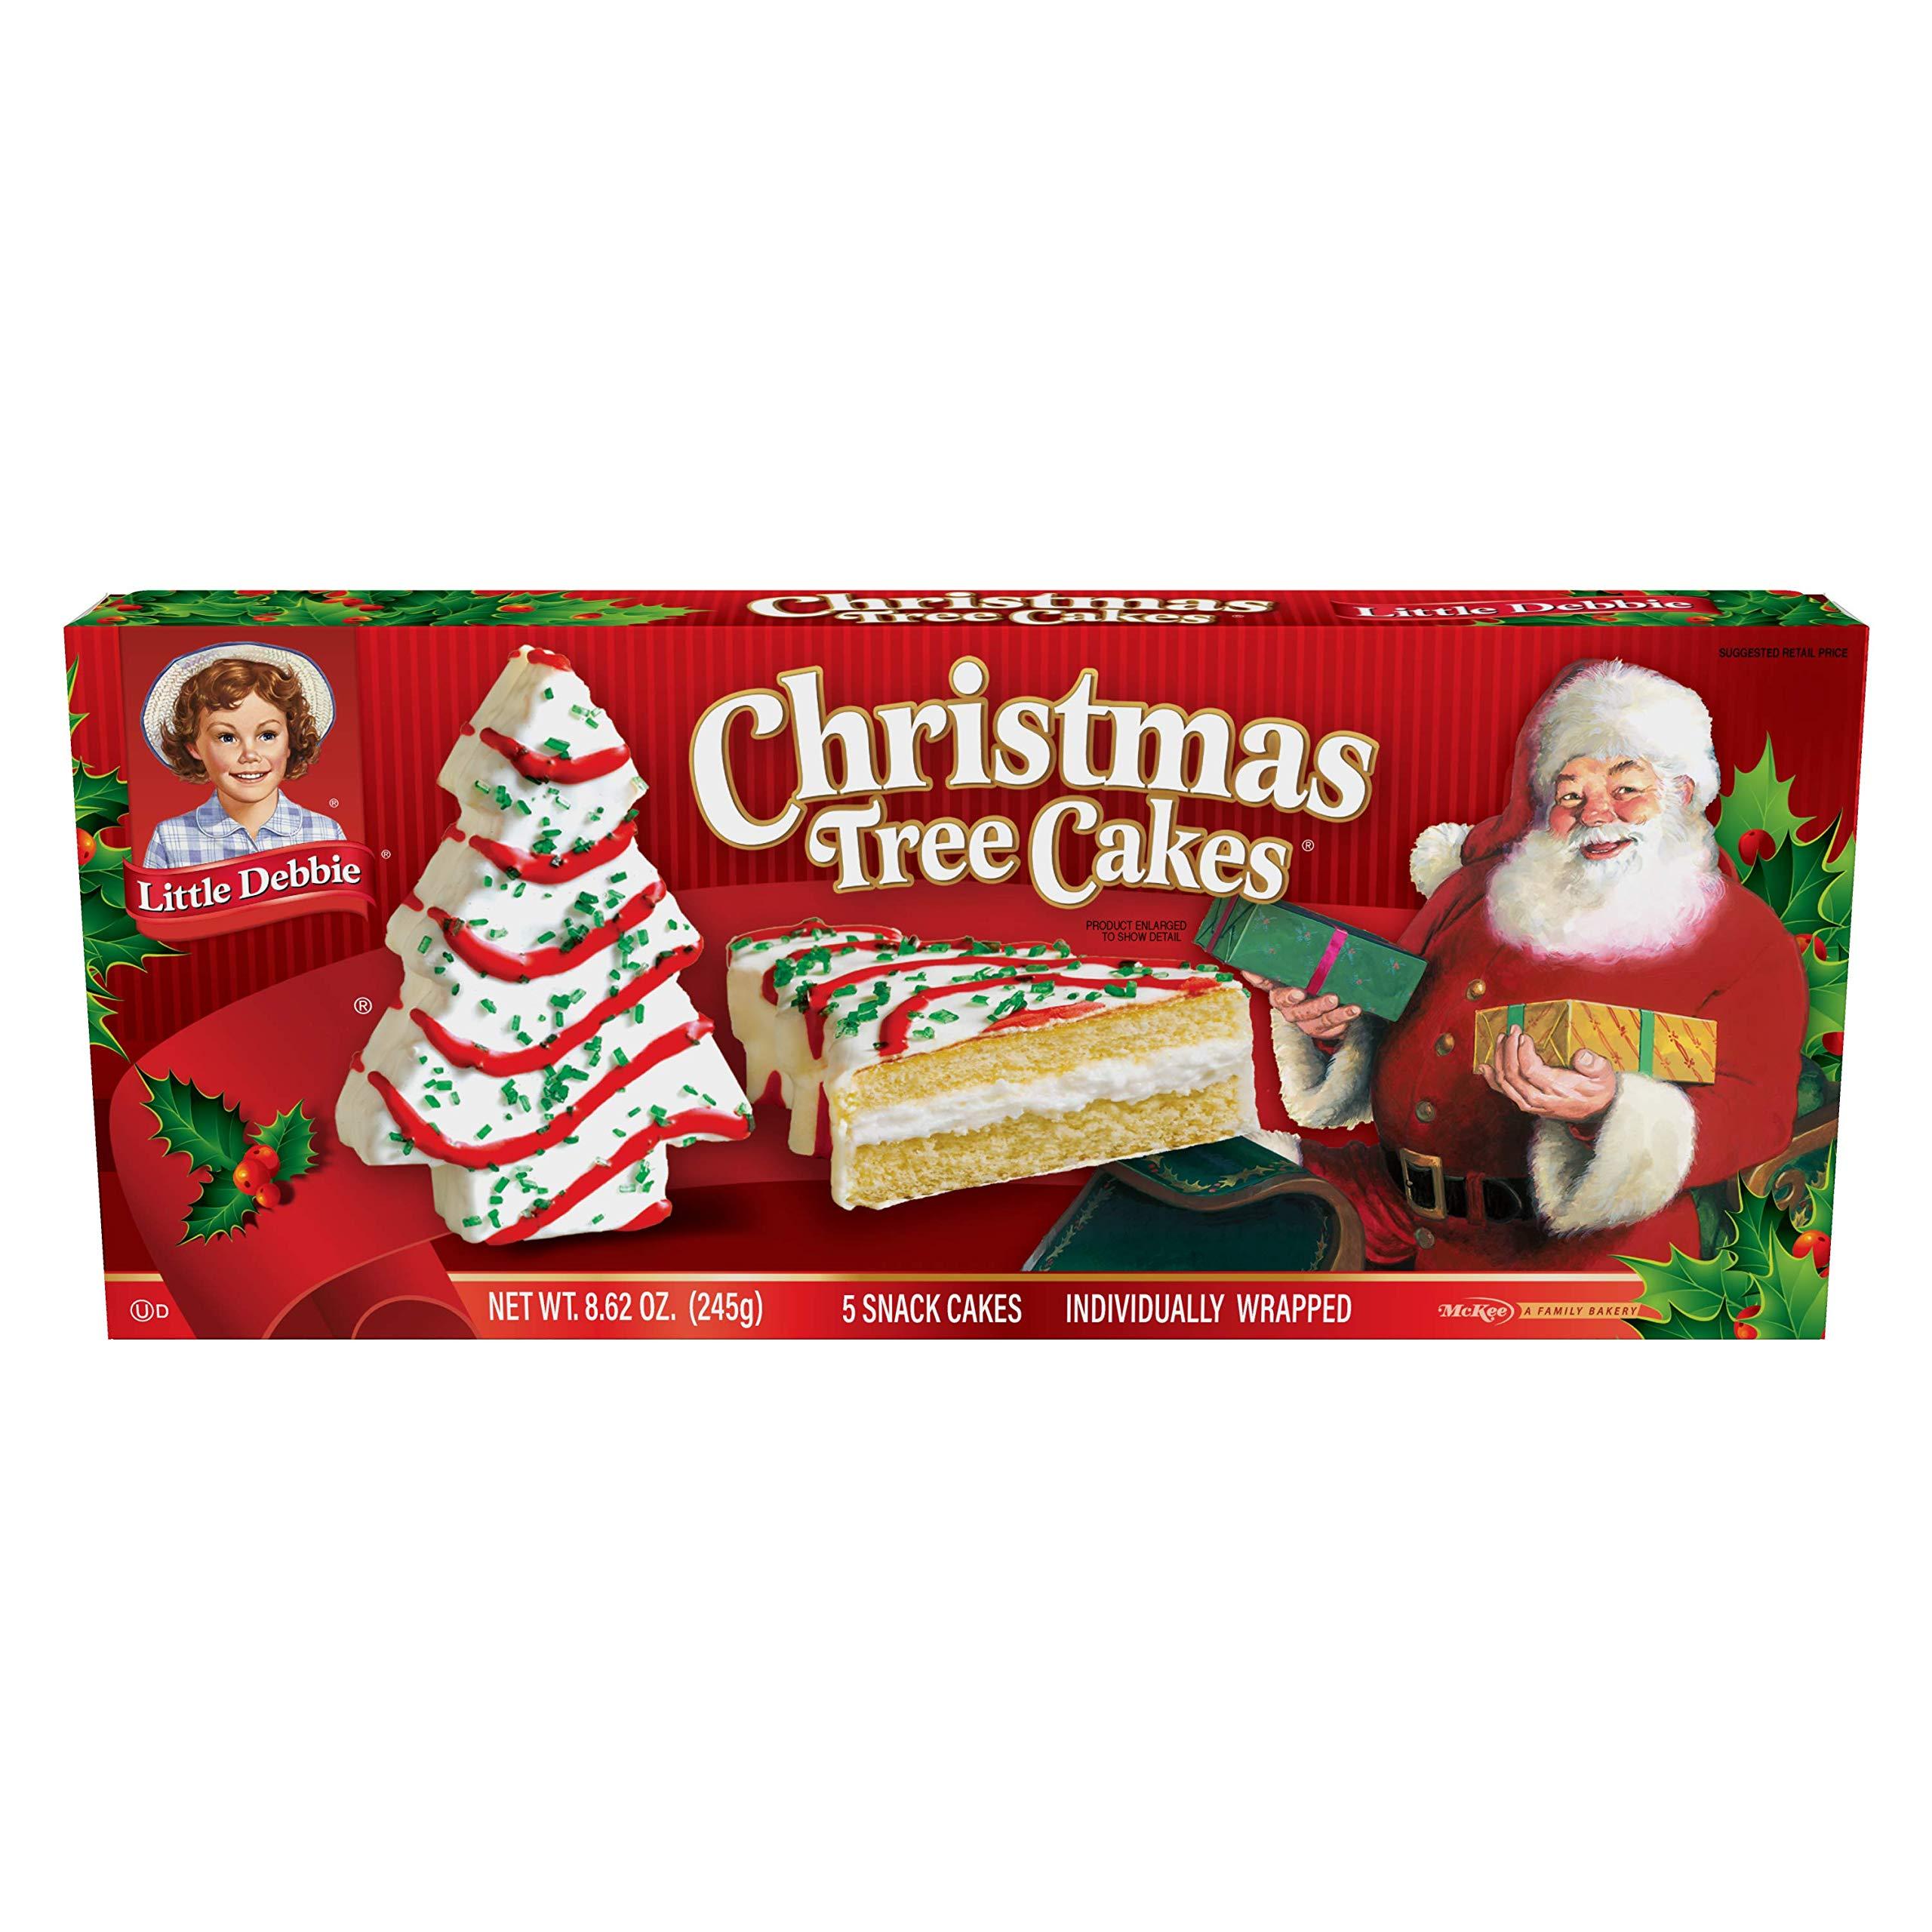 Little Debbie Christmas Tree Cakes (Vanilla)